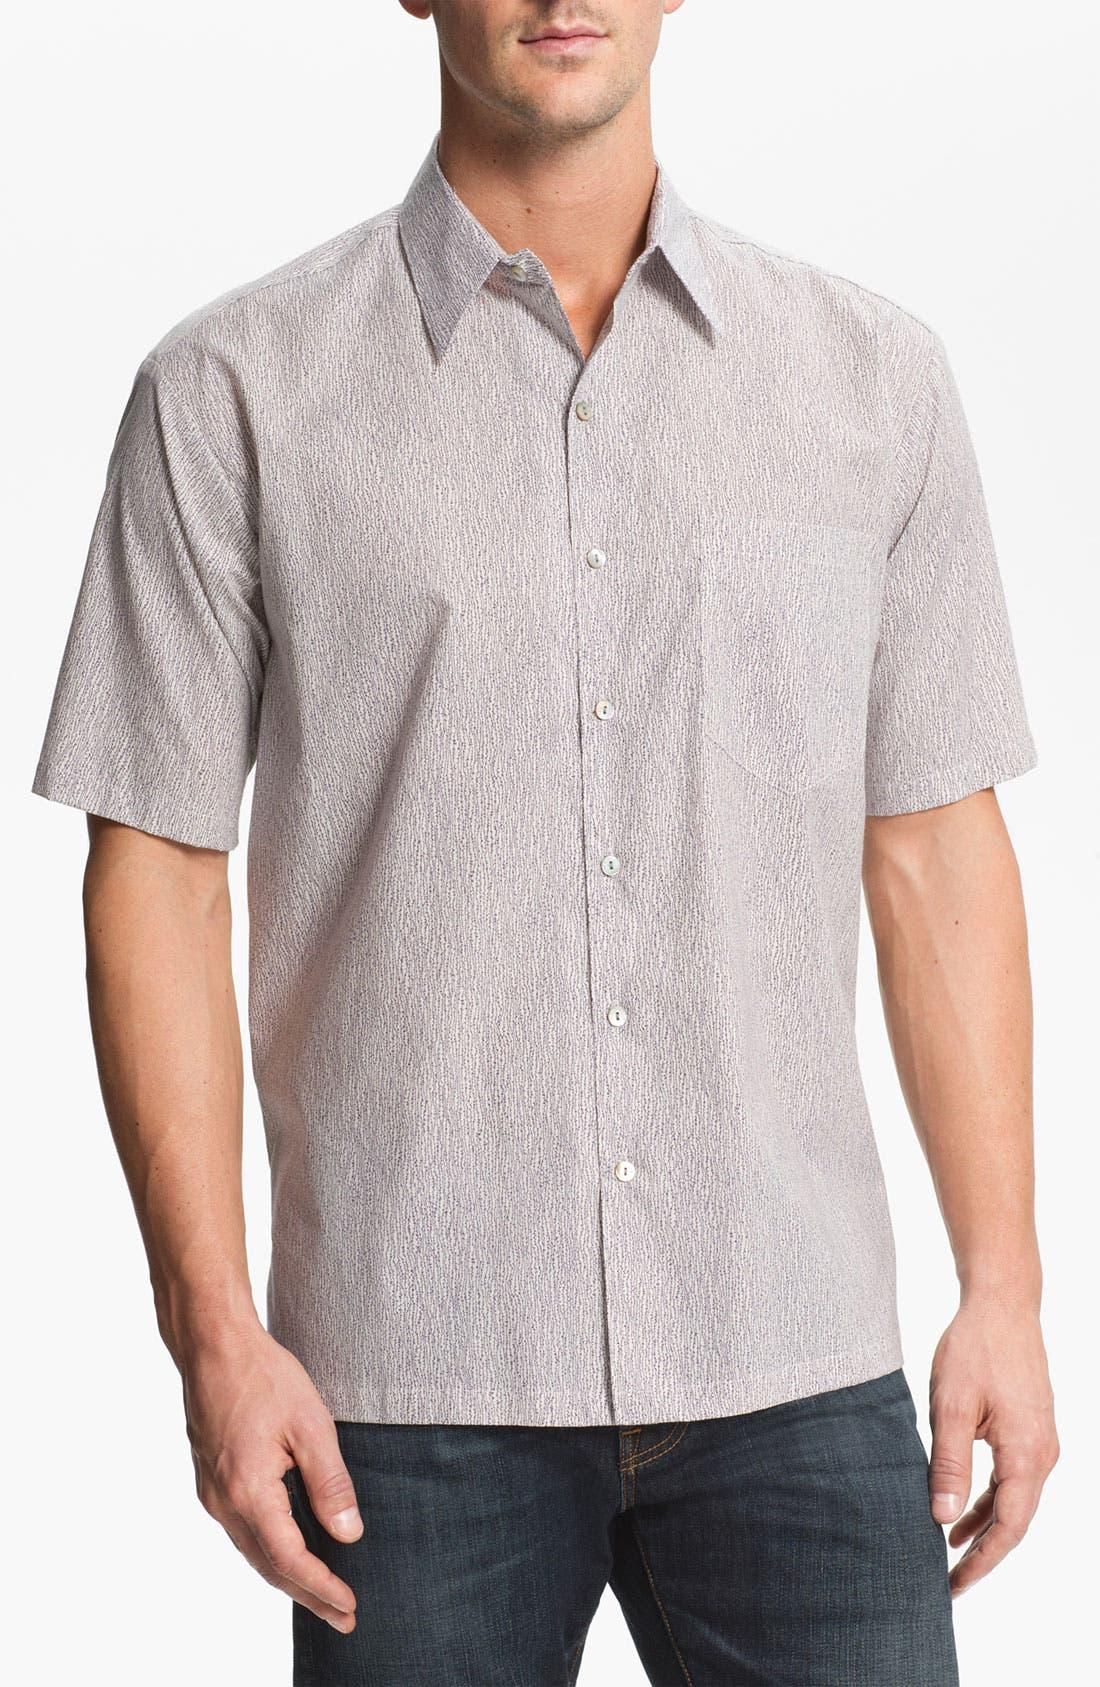 Main Image - Tori Richard 'Ivy League' Regular Fit Sport Shirt